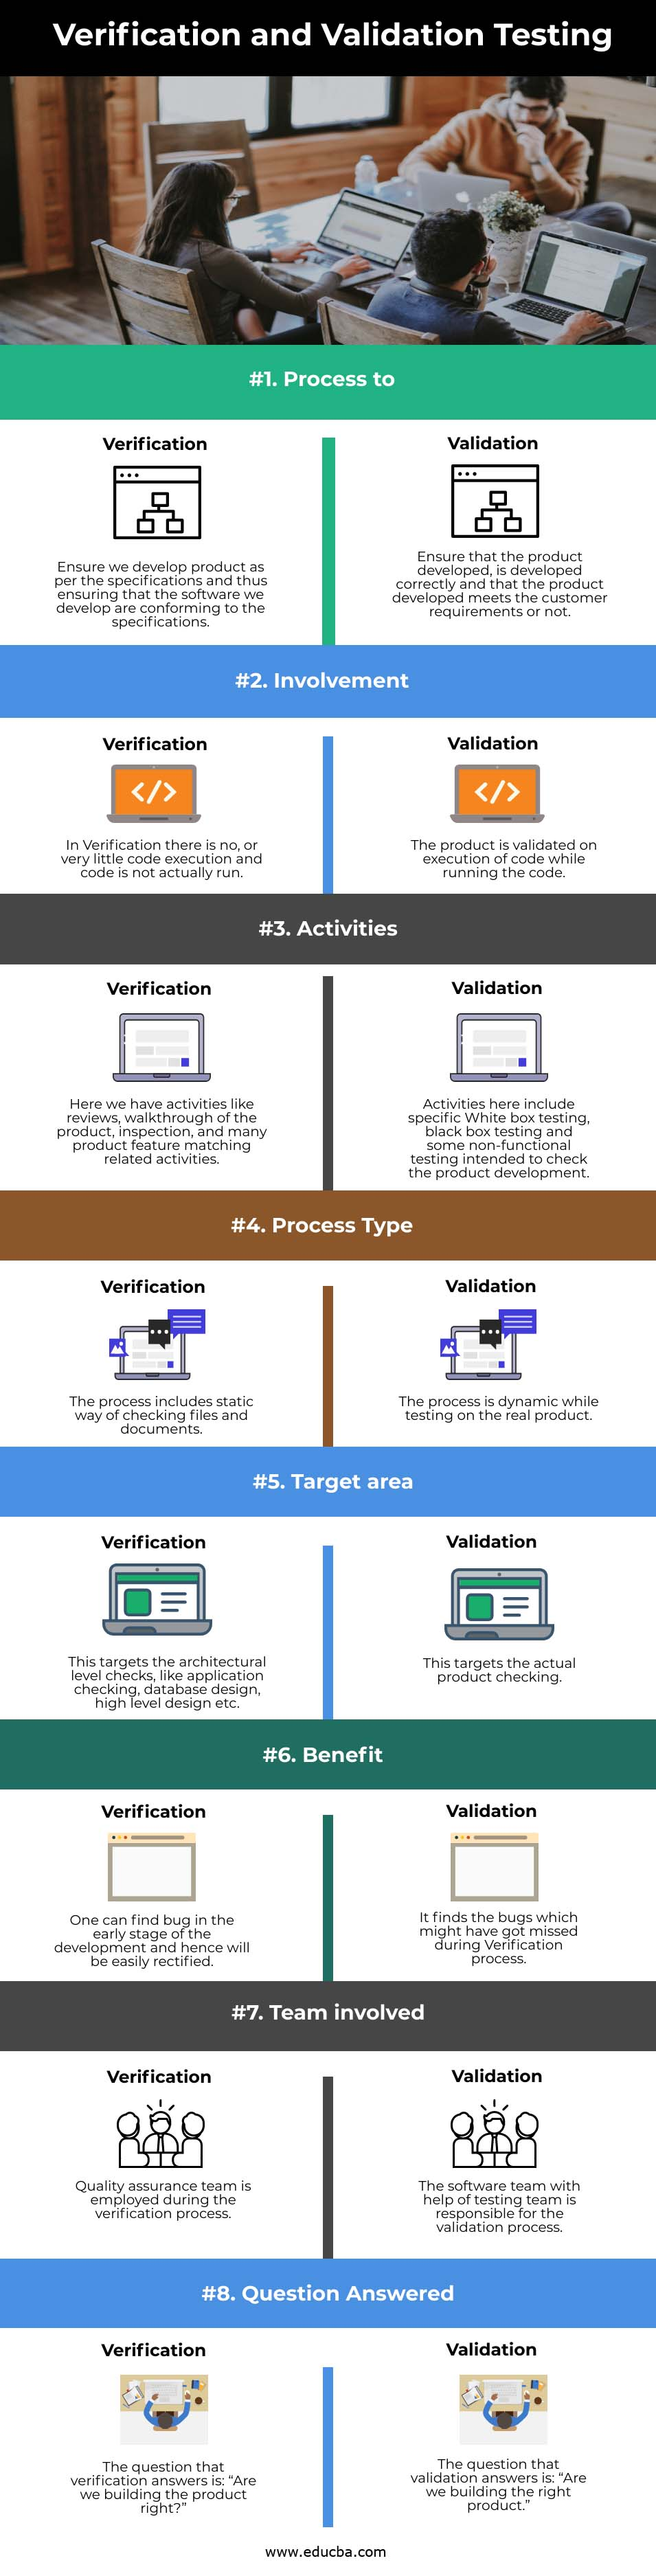 Verification and Validation Testing info